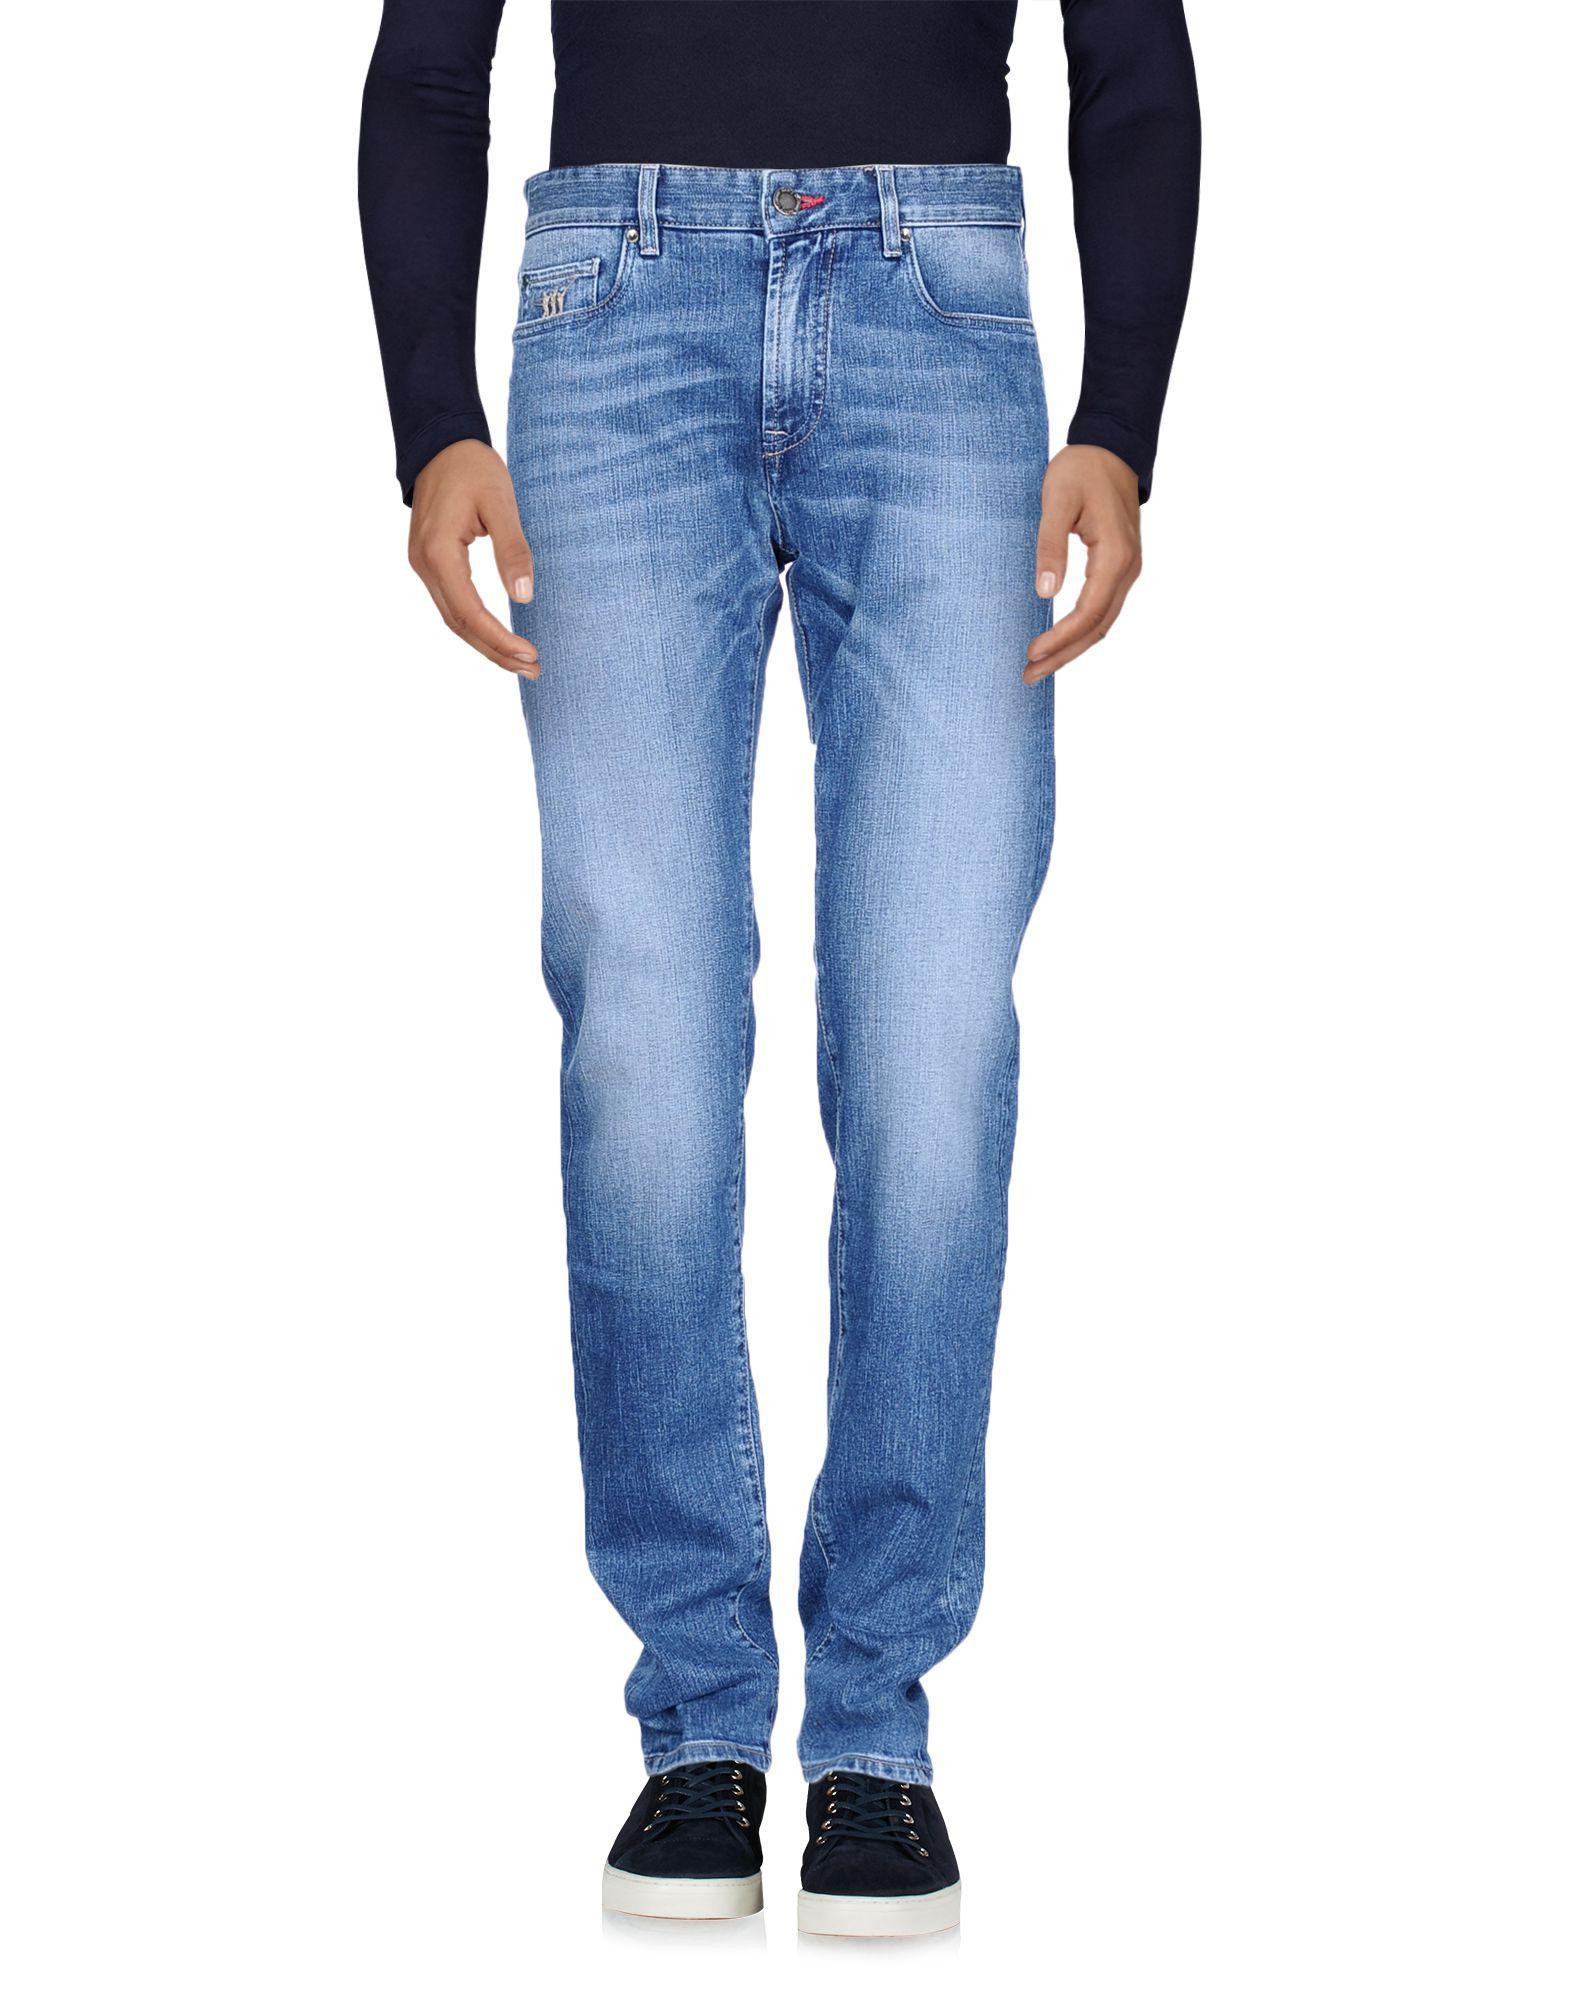 Denim - Pantalon En Denim Henry Cotton's pQLDUl